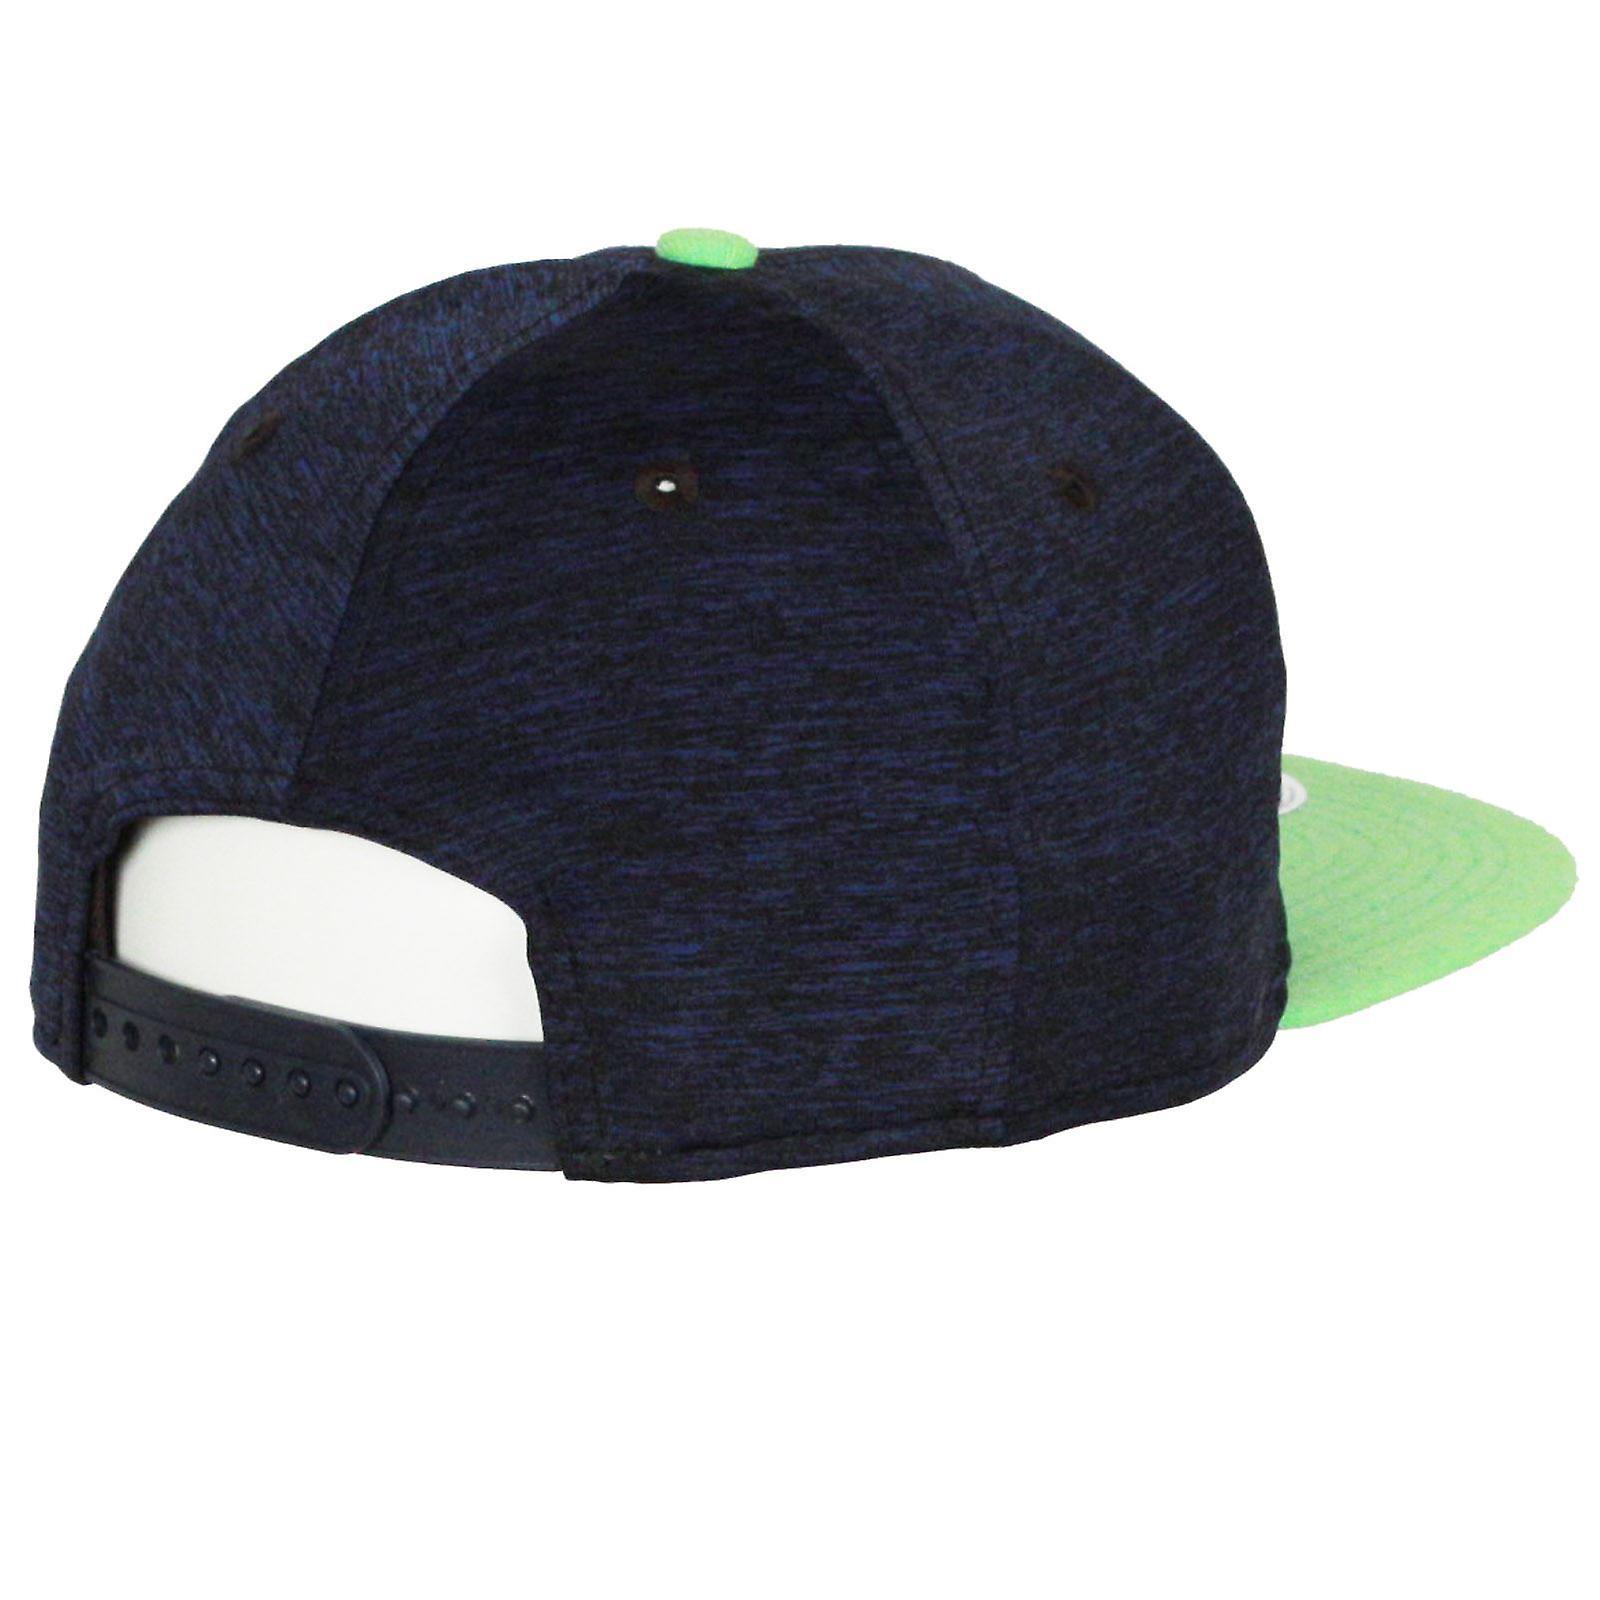 New Era and NHL Sports Jersey 9Fifty Flatbill Cap ~ Seattle Seahawks